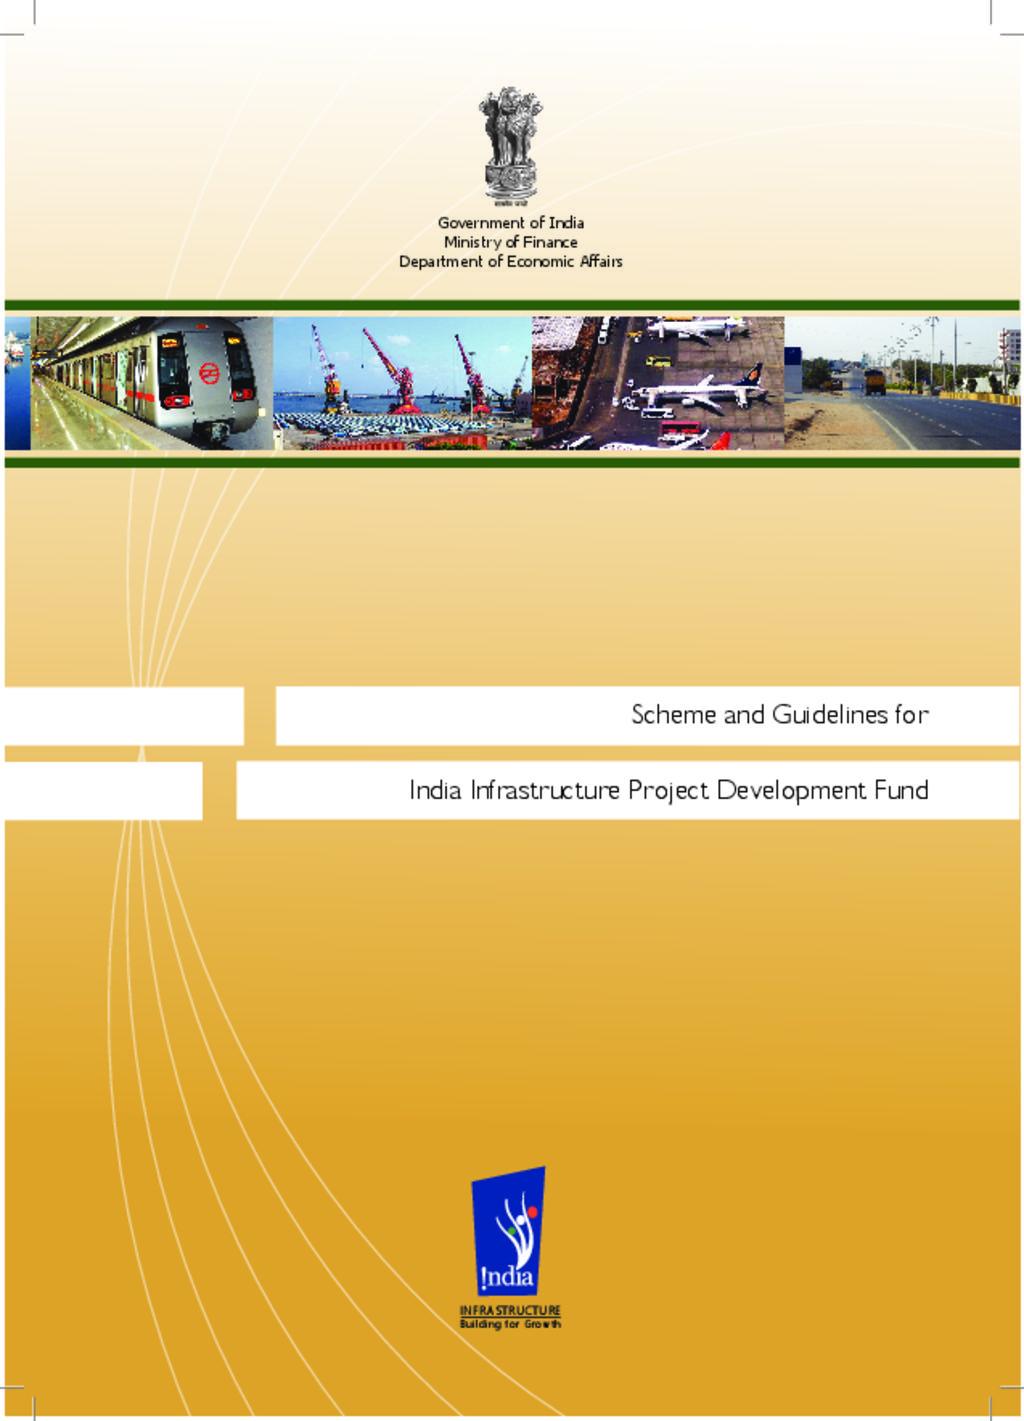 IIPDF guidelines